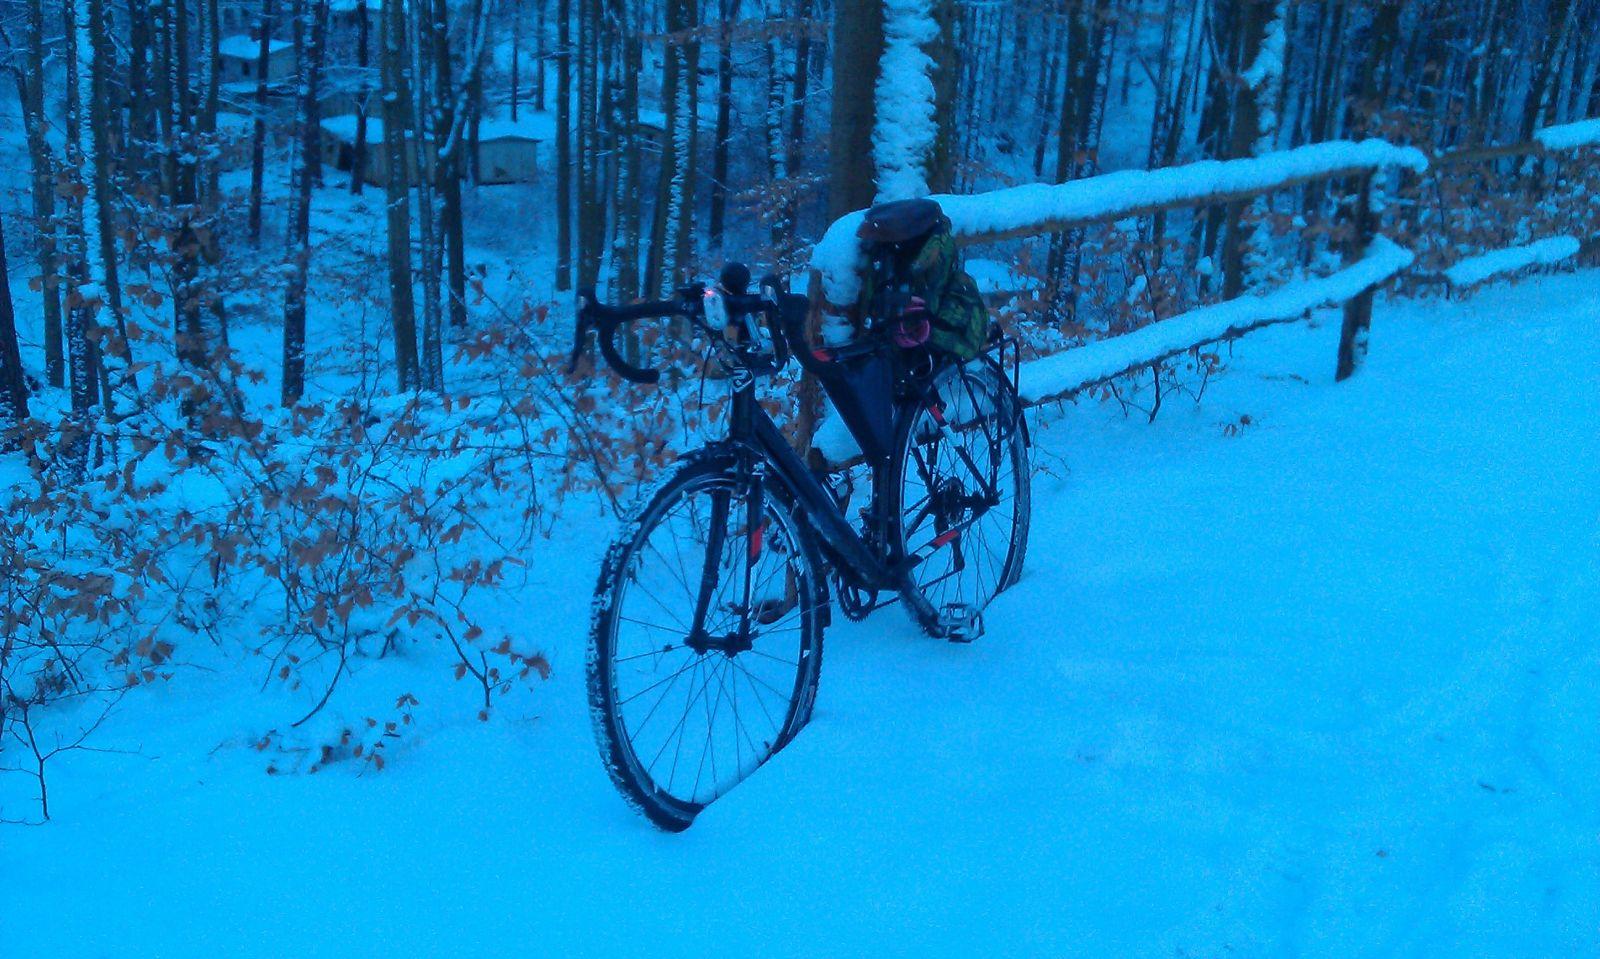 RIdley X-bow zimą 4.